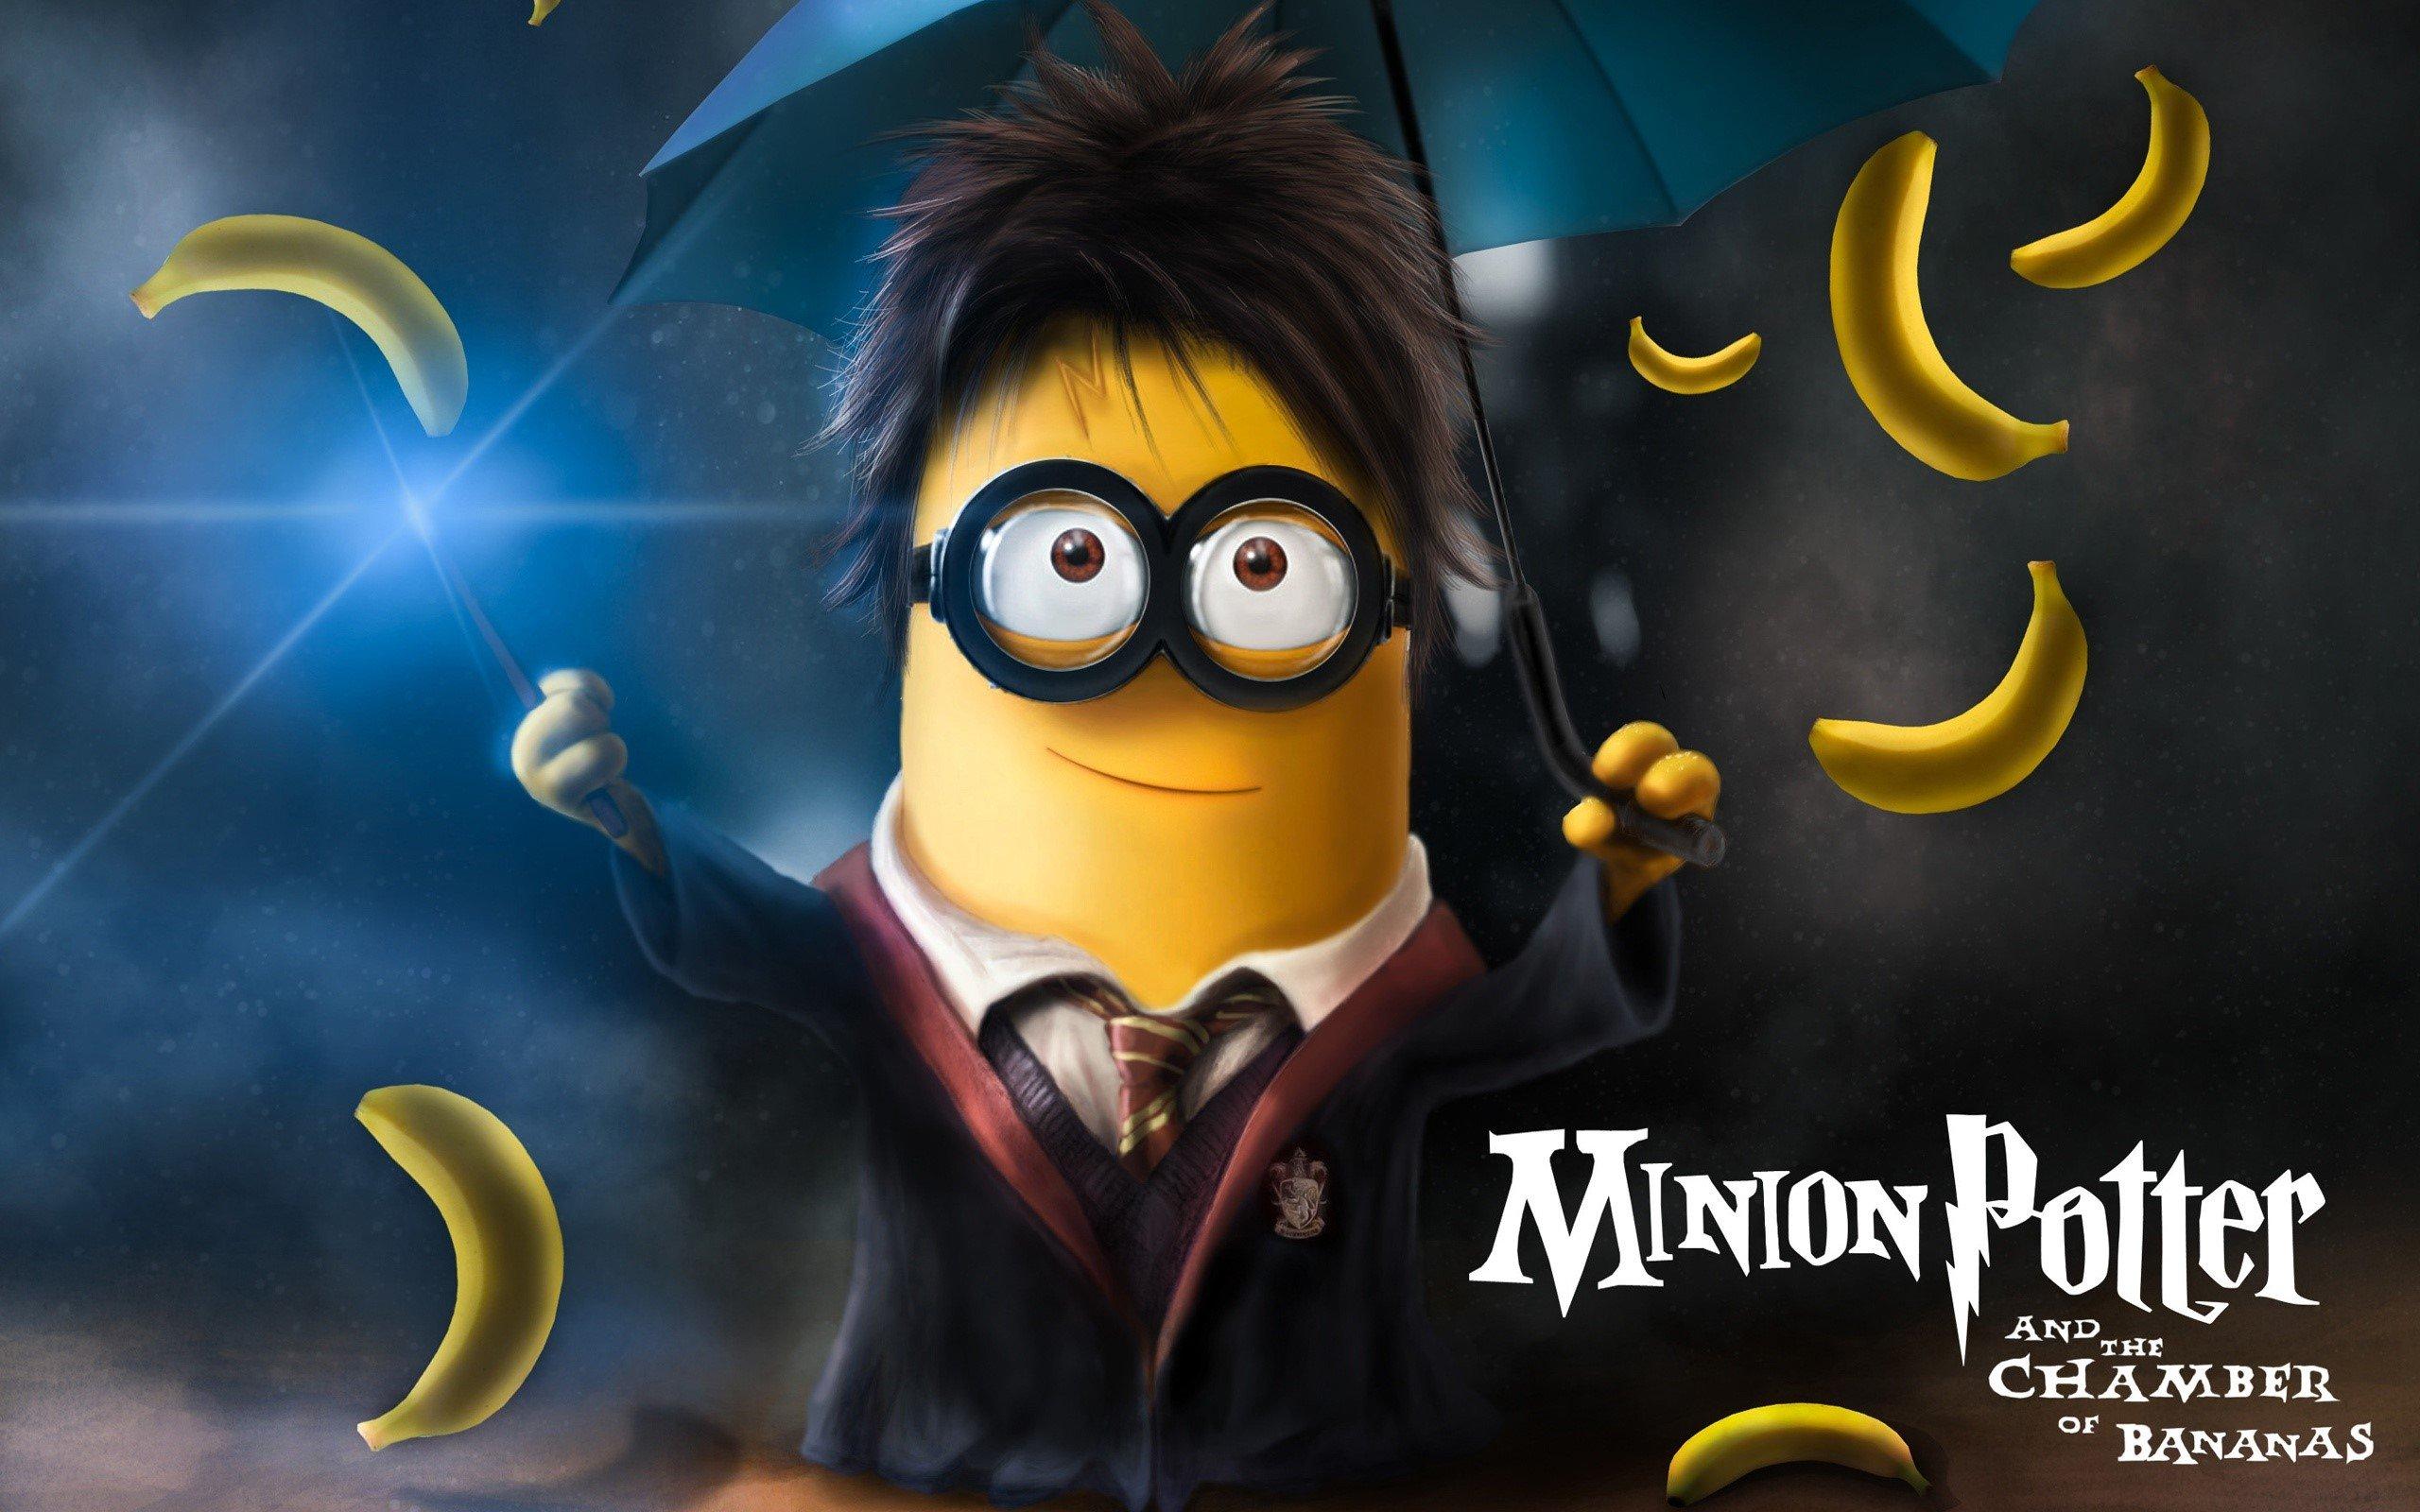 Fondo de pantalla de Minion Potter Imágenes